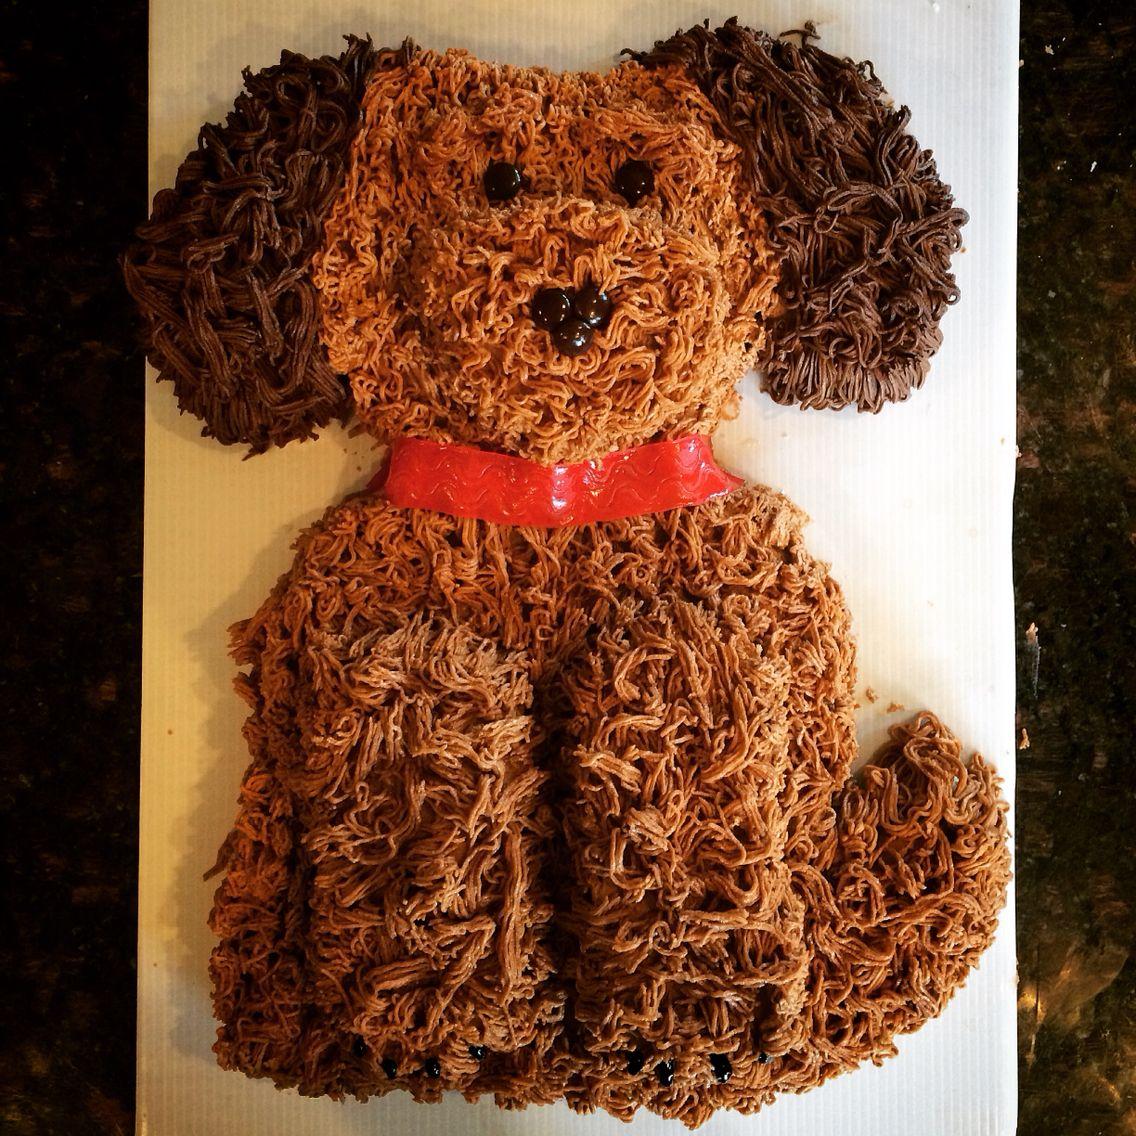 Ellie S 4th Birthday Cake Golden Doodle Dog Cake Based On Betty